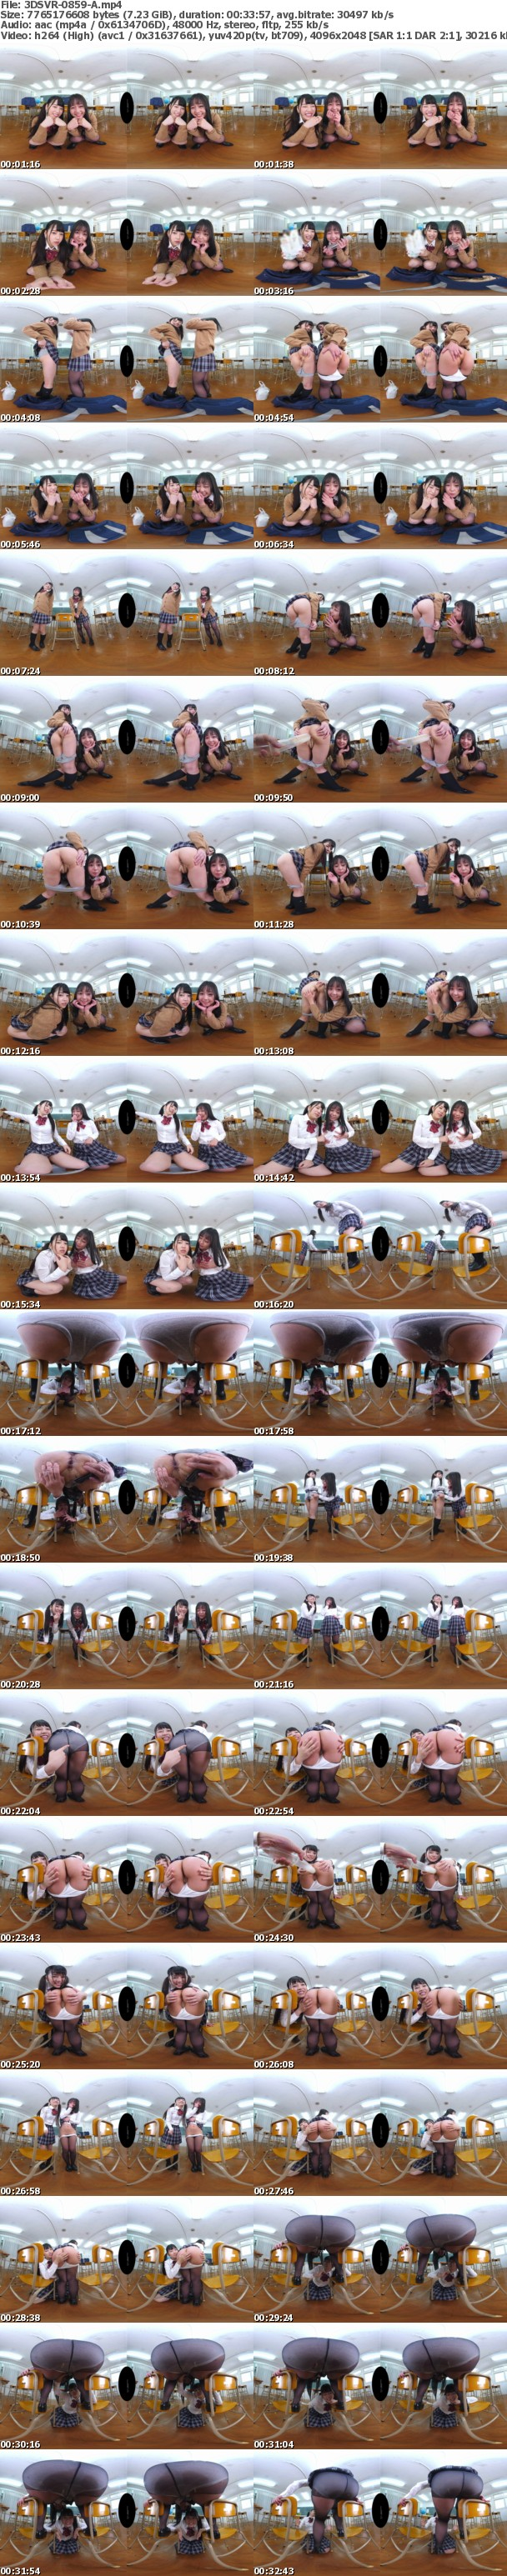 (VR) 3DSVR-0859 放課後の教室で女子生徒のアナルから噴射する牛乳が顔面にブッかかりまくる! 牛乳浣腸ぶっかけVR